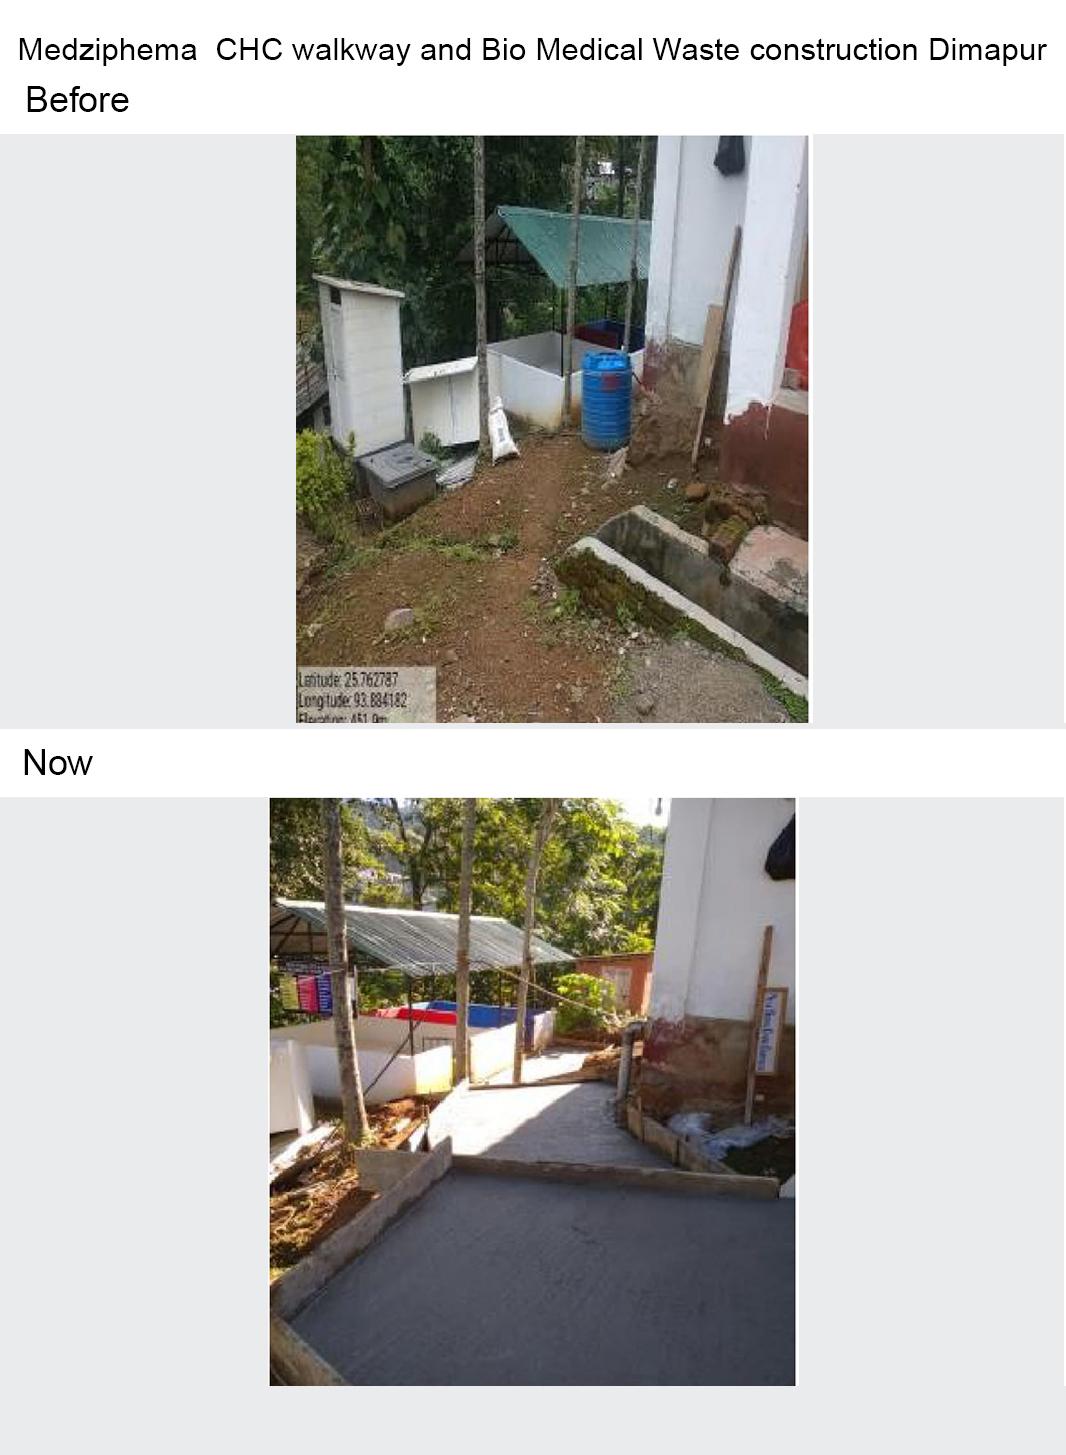 Medziphema--CHC-walkway-and-Bio-Medical-Waste-construction-Dimapur